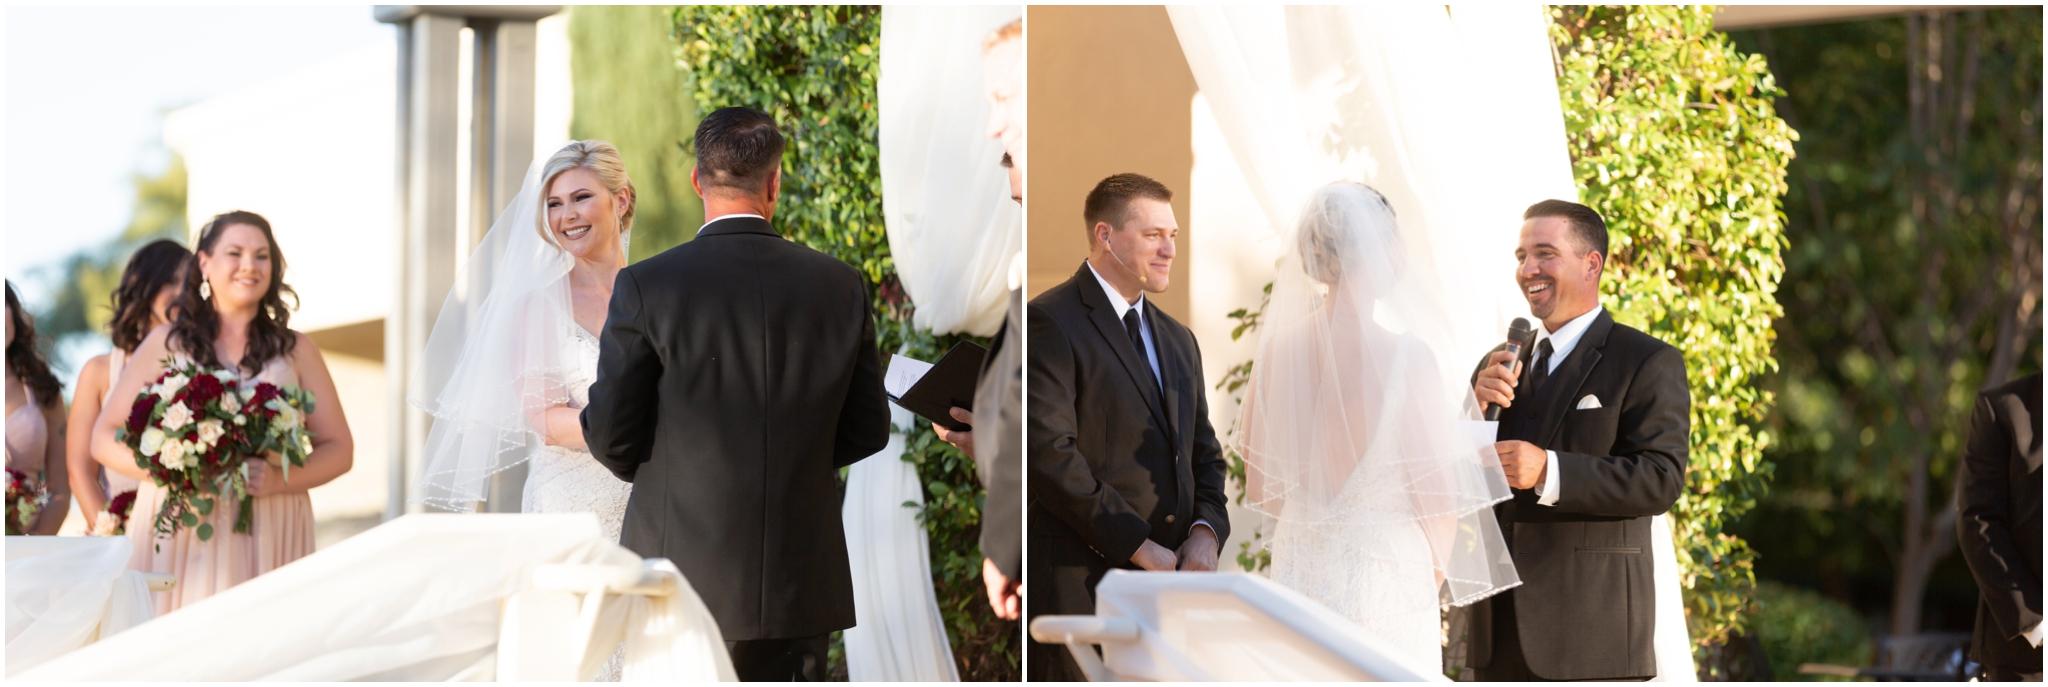 shelly_michael_wedding_redding_blog_0017.jpg